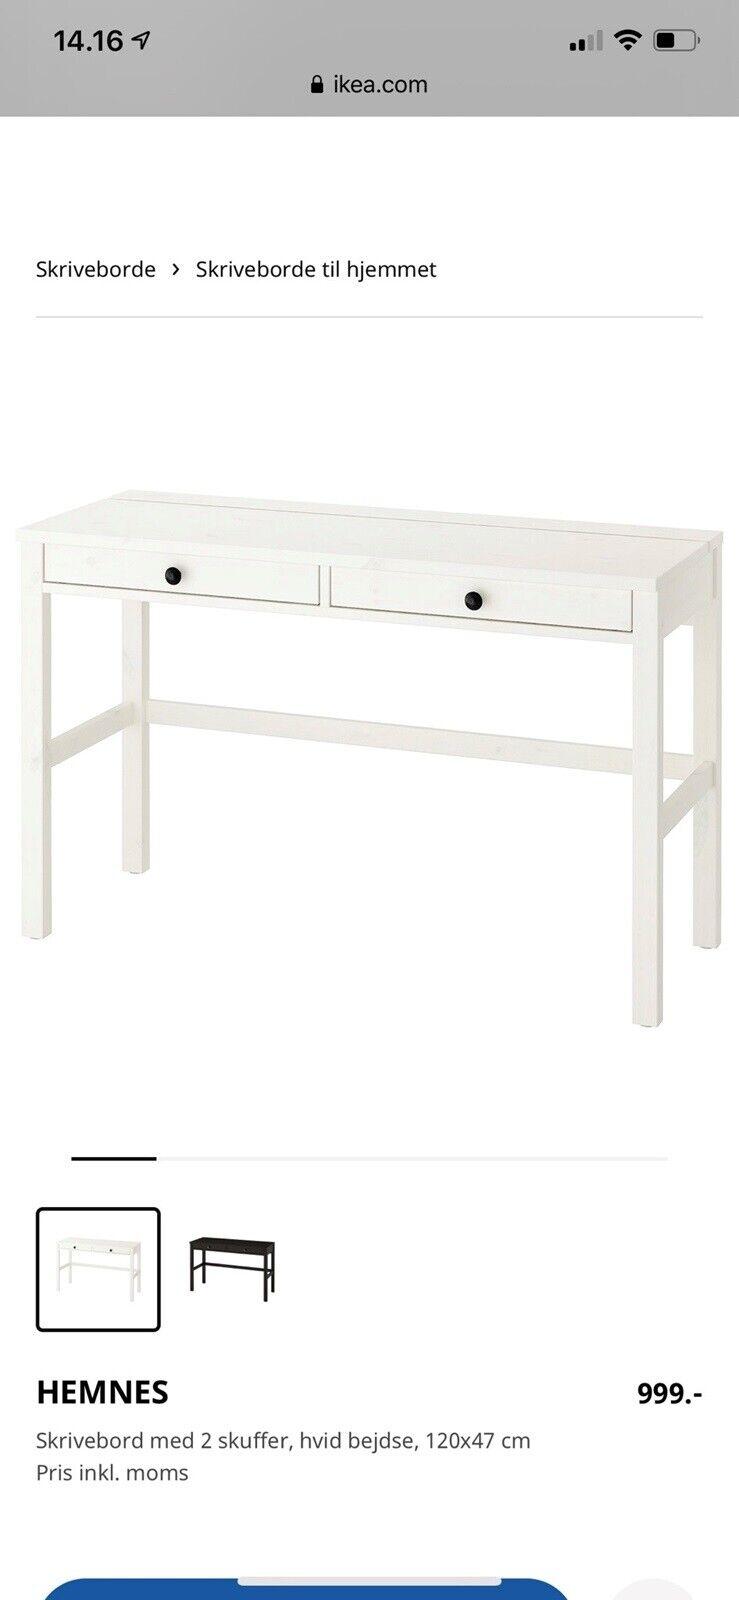 Picture of: Hemnes Skrivebord Med 2 Skuffer Sortbrun 120×47 Cm Ikea